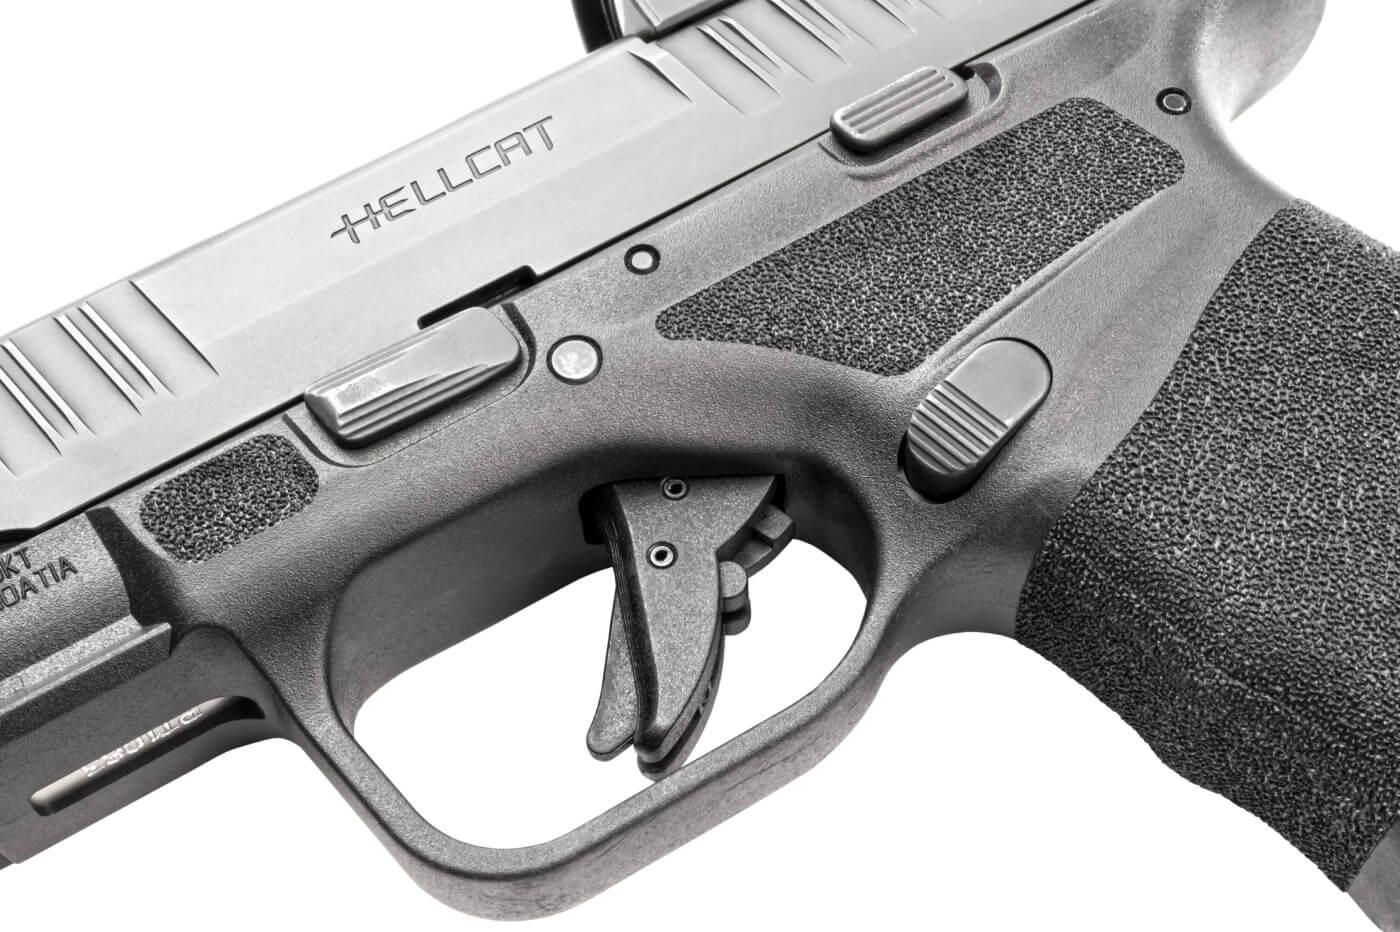 Trigger assembly of the Hellcat pistol